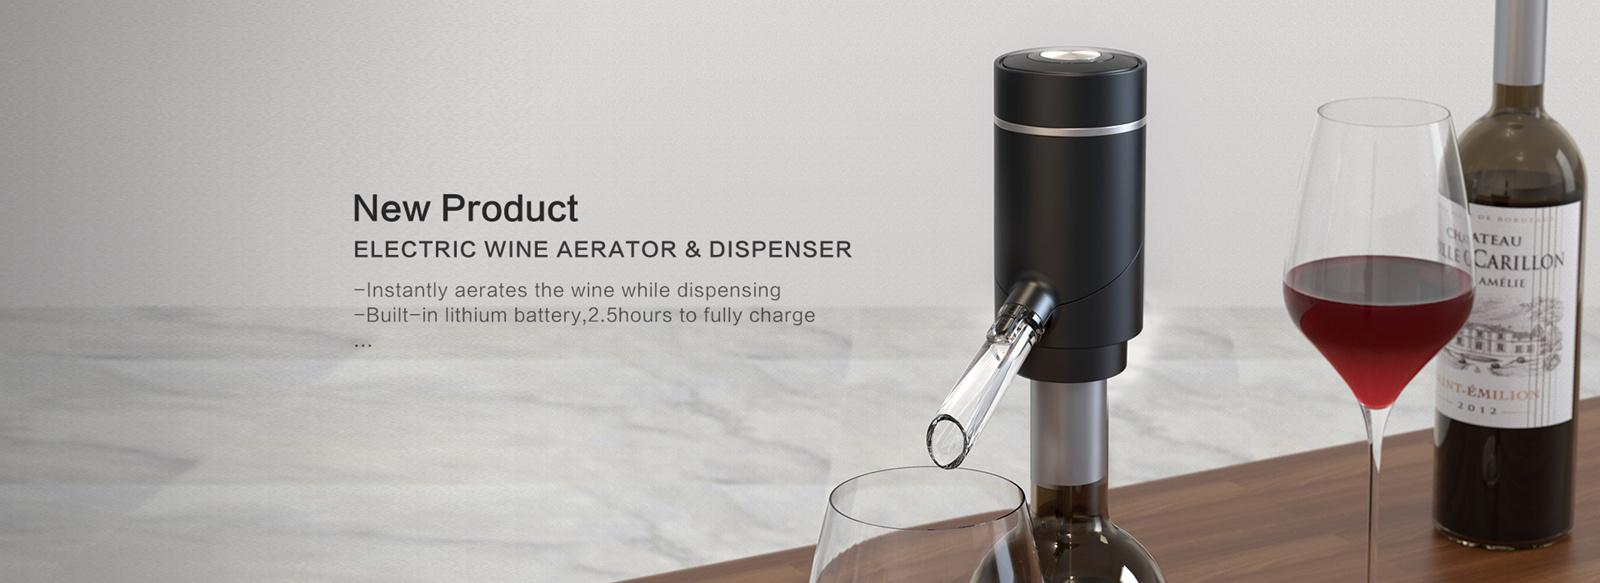 KLT Electric Wine Aerator & Dispenser